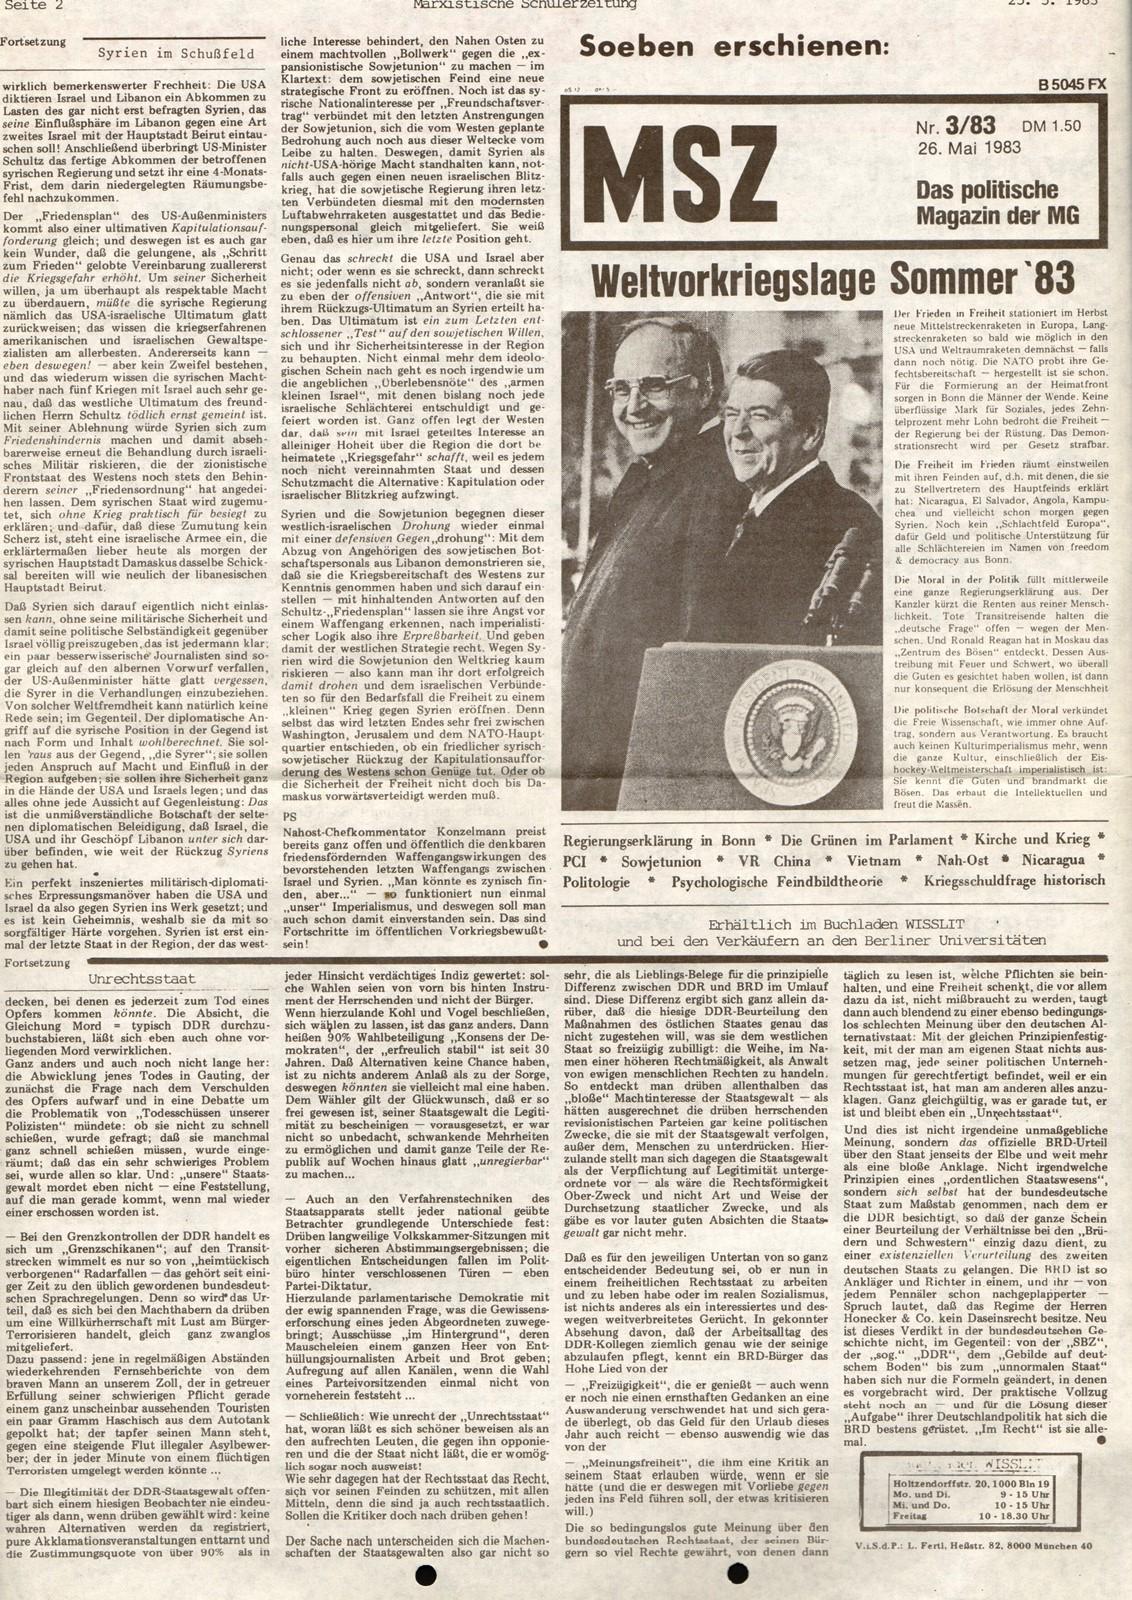 Berlin_MG_Marxistische_Schuelerzeitung_19830525_02